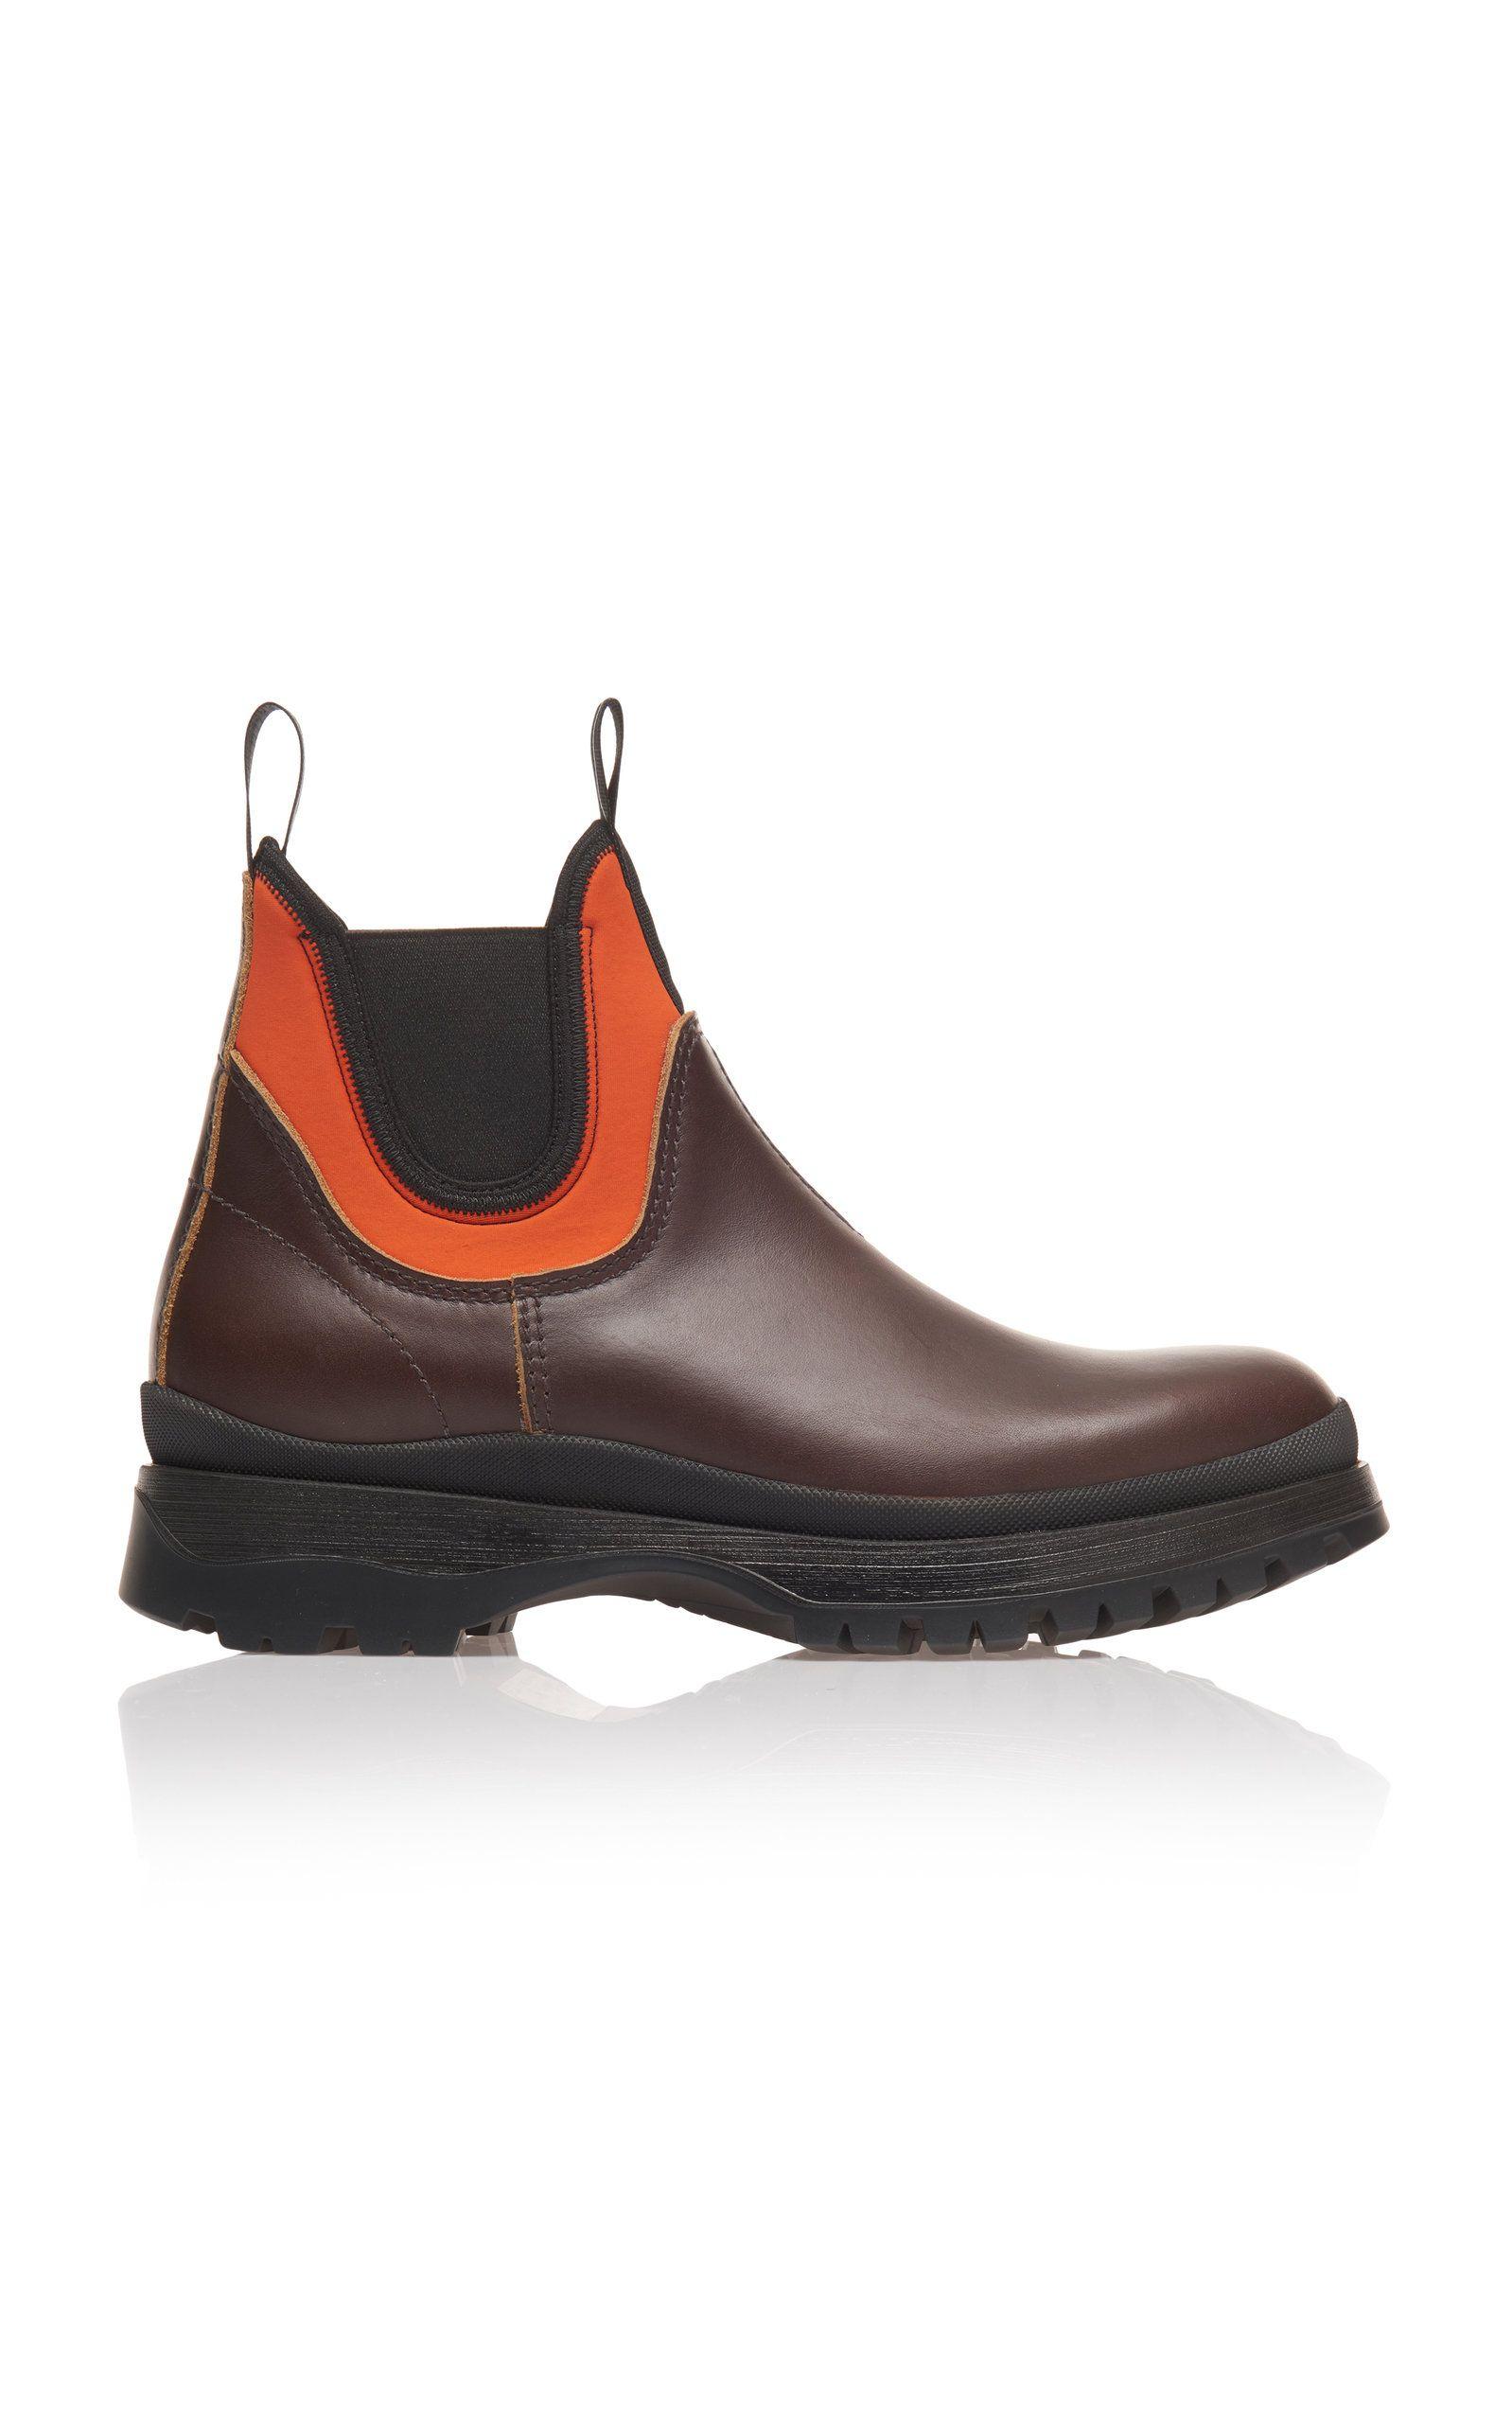 PRADA - boots - Leather And Neoprene